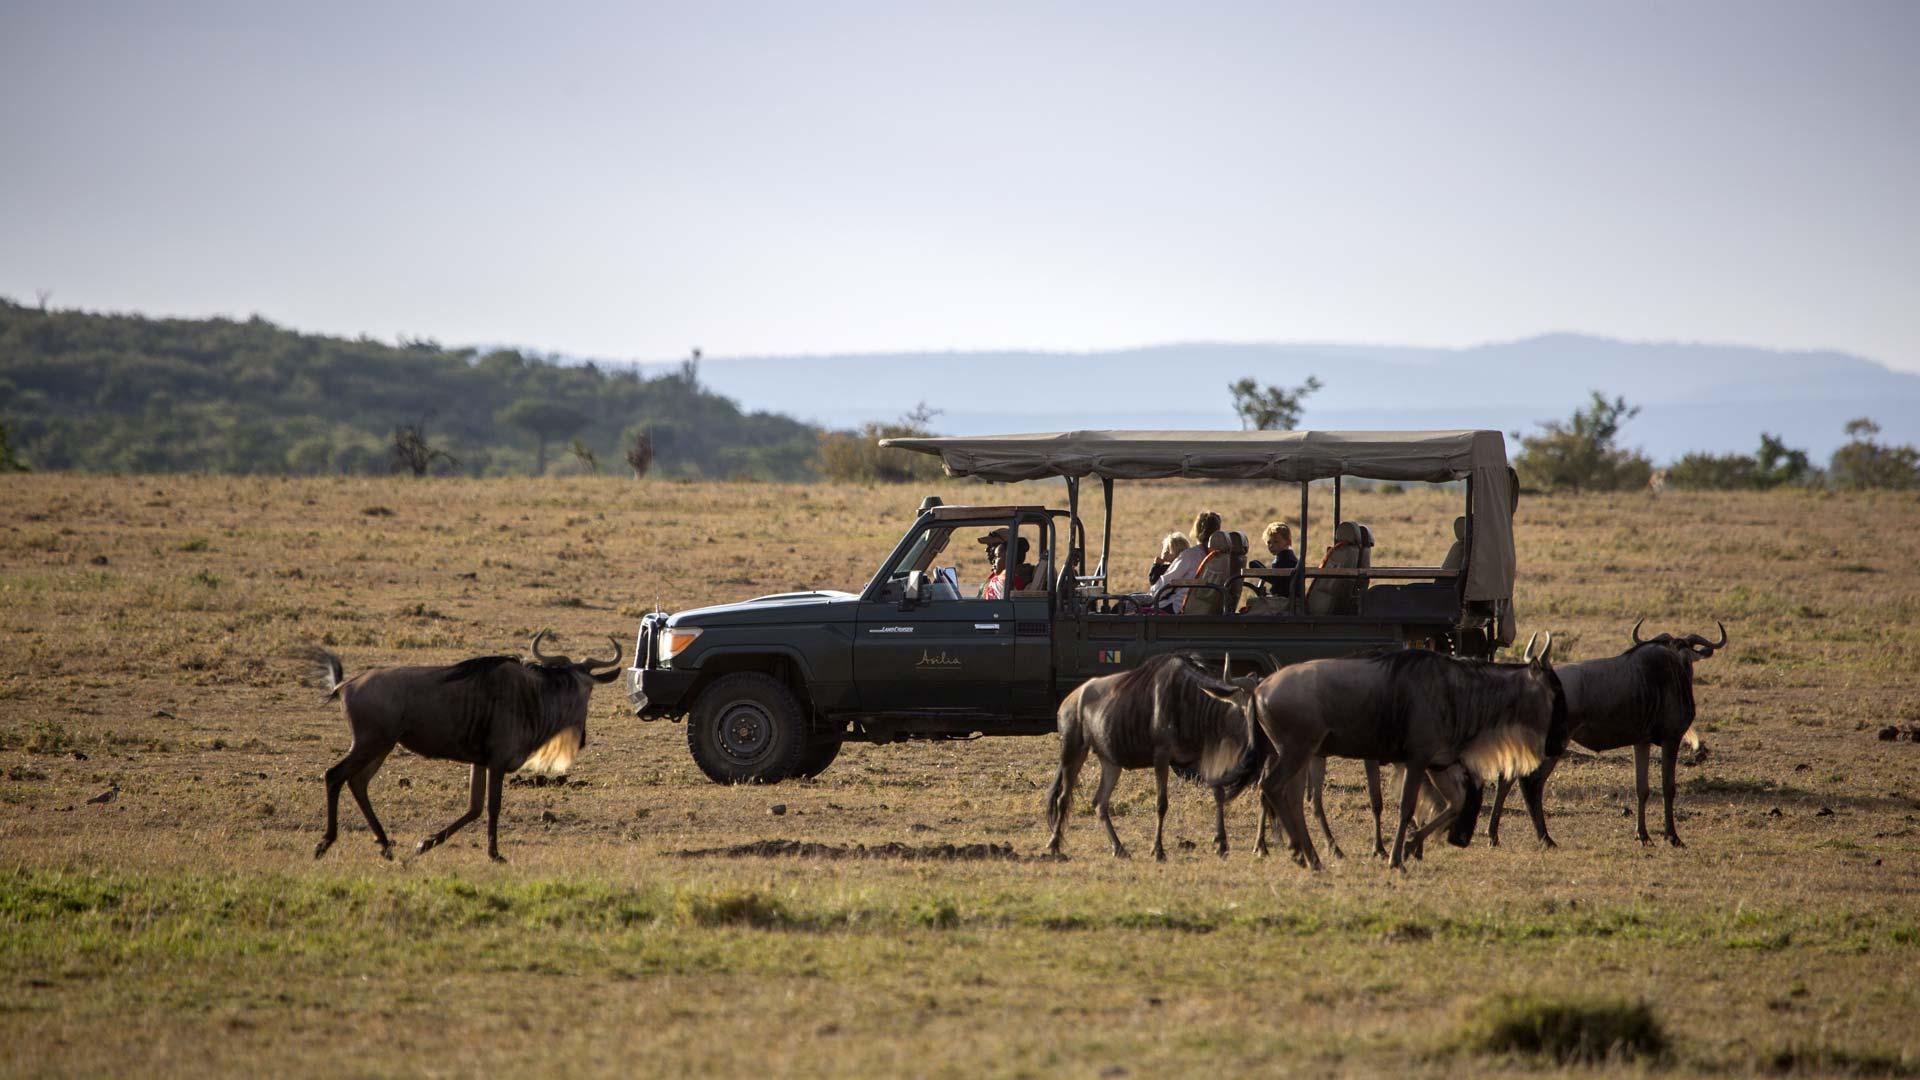 Open 4x4 with wildebeest